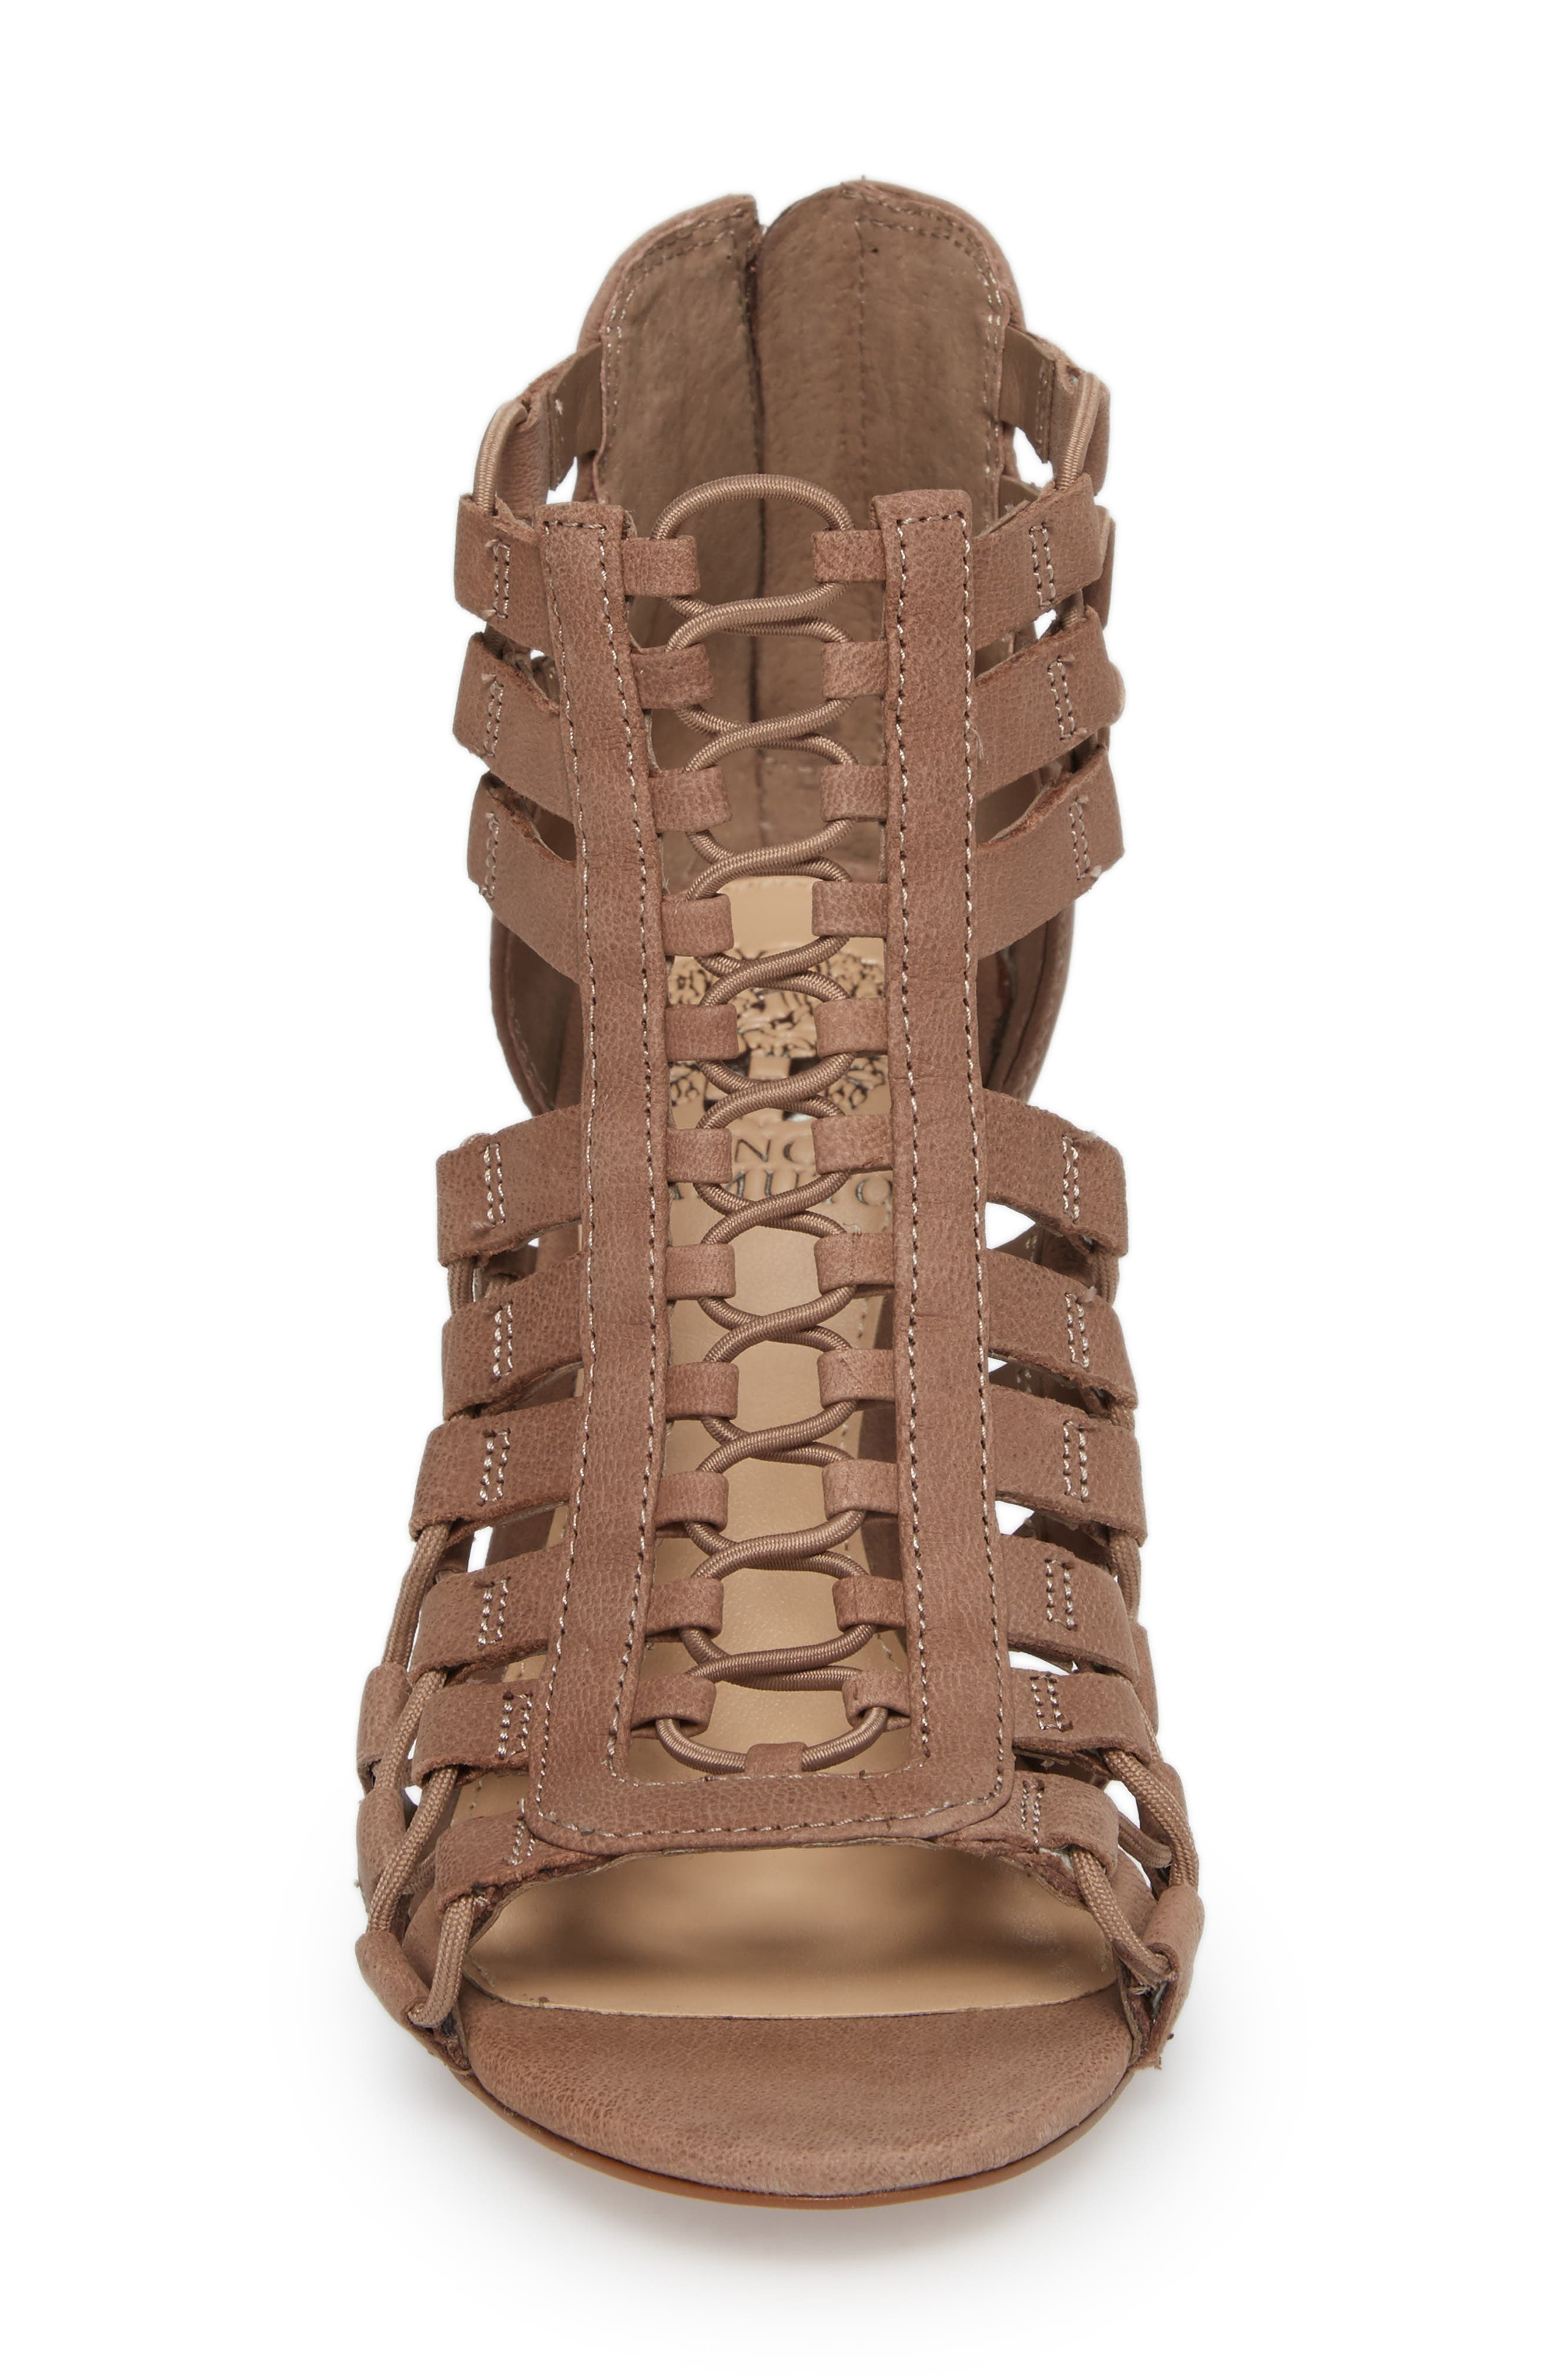 Elanso Sandal,                             Alternate thumbnail 4, color,                             Urban Lux Leather